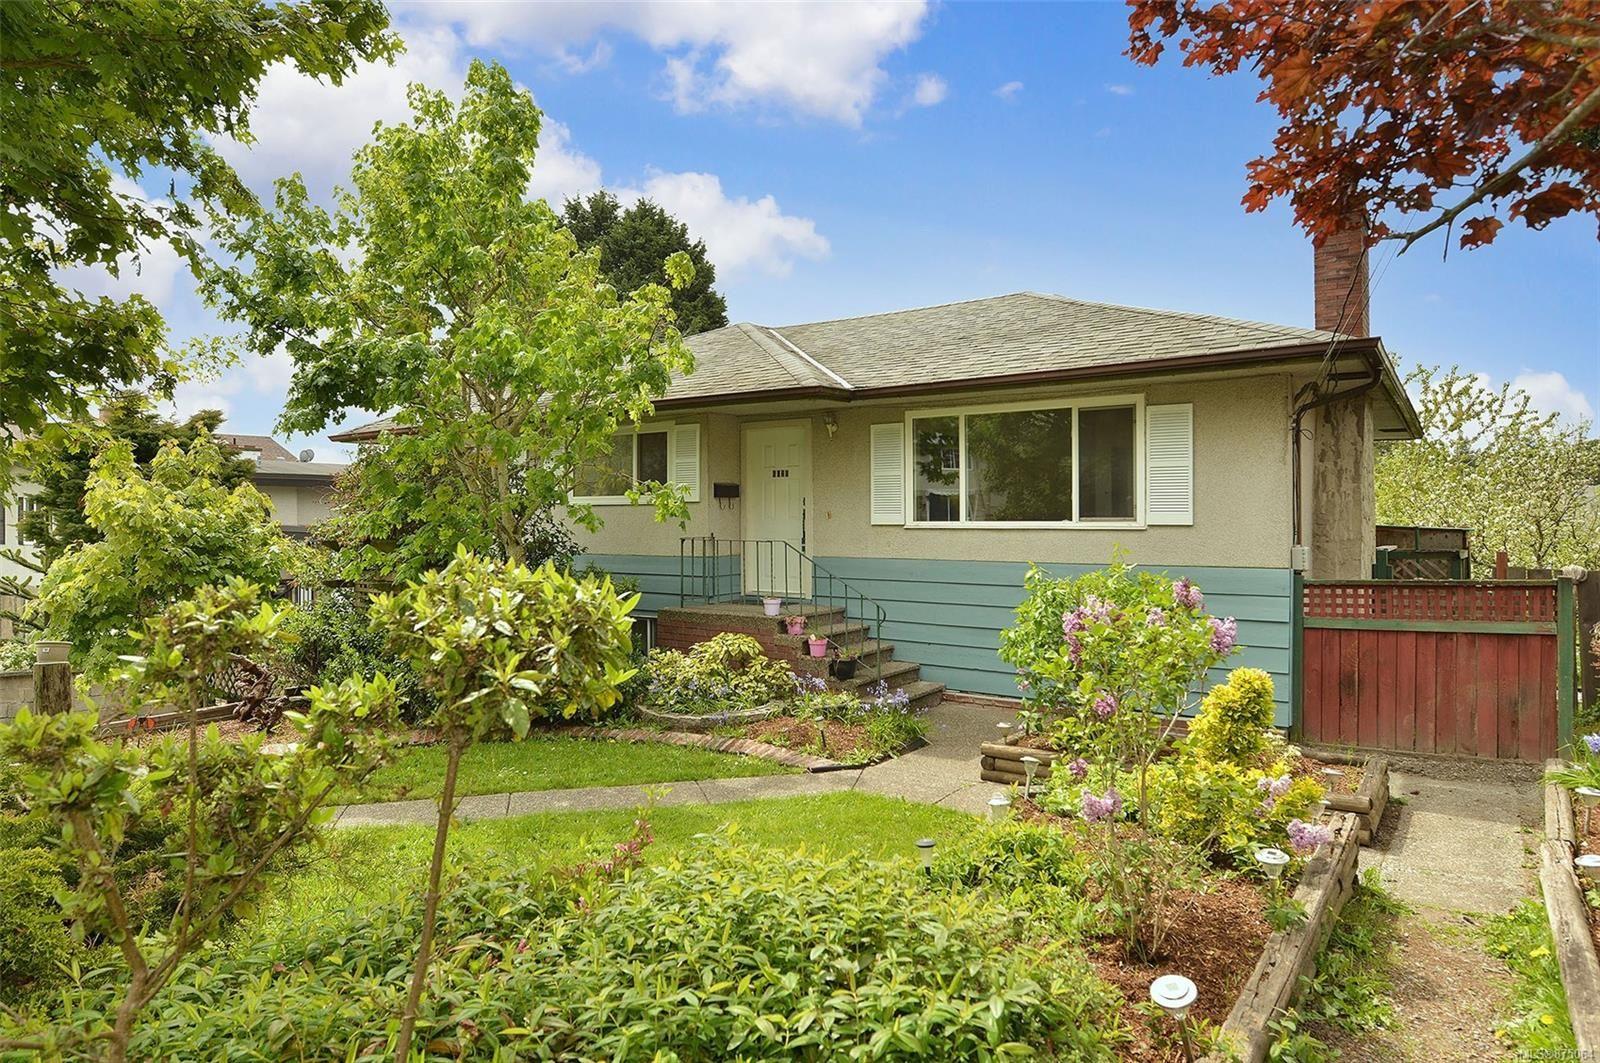 Main Photo: 4026 McLellan St in : SW Glanford House for sale (Saanich West)  : MLS®# 875064